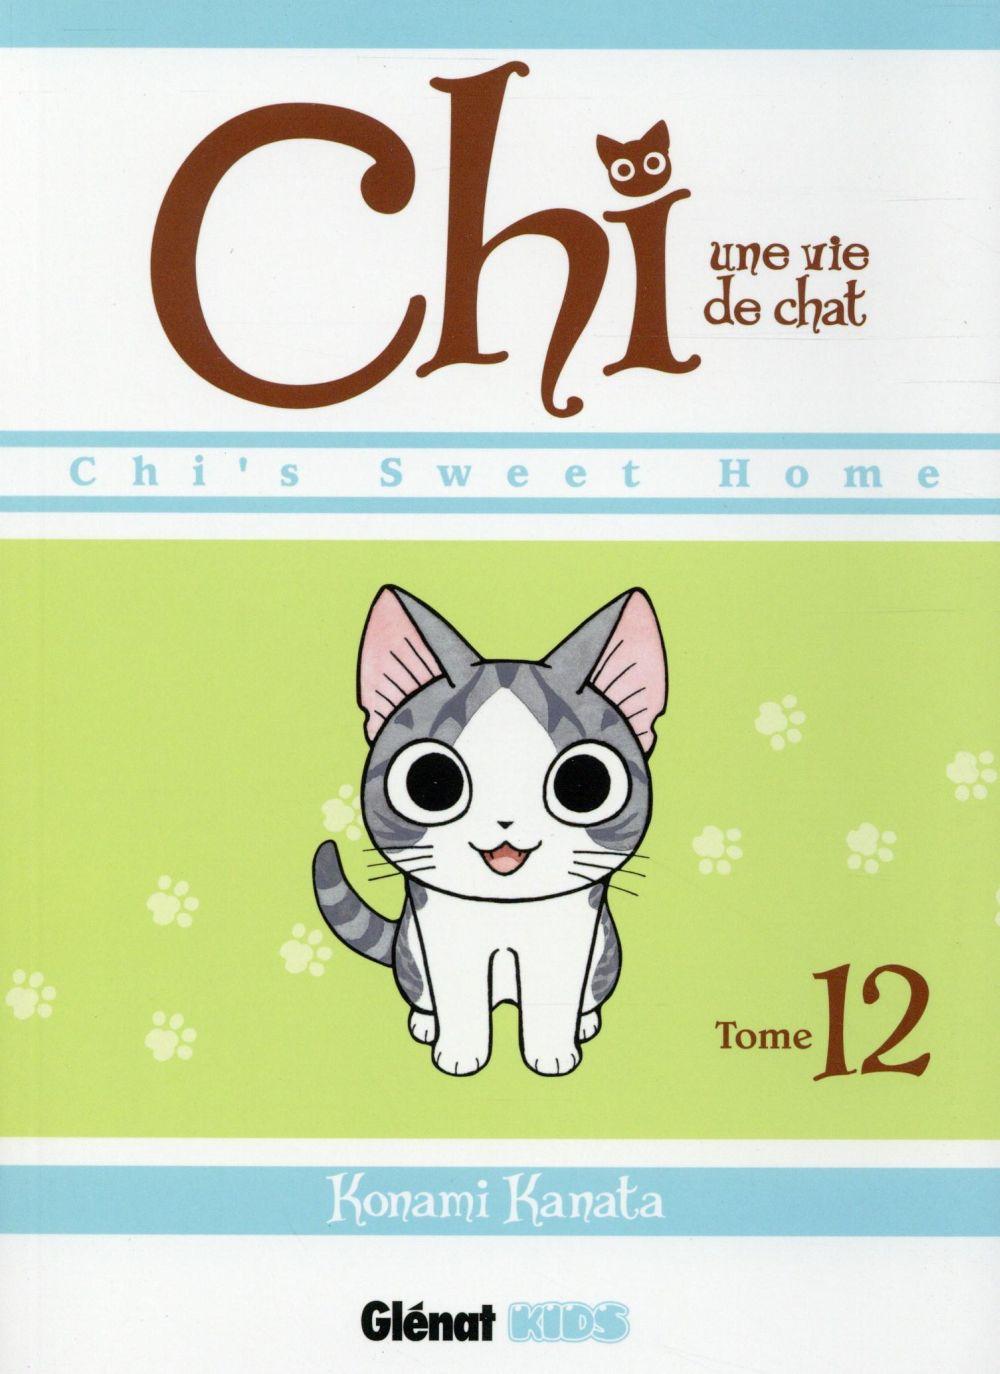 CHI - UNE VIE DE CHAT - TOME 12 Konami Kanata